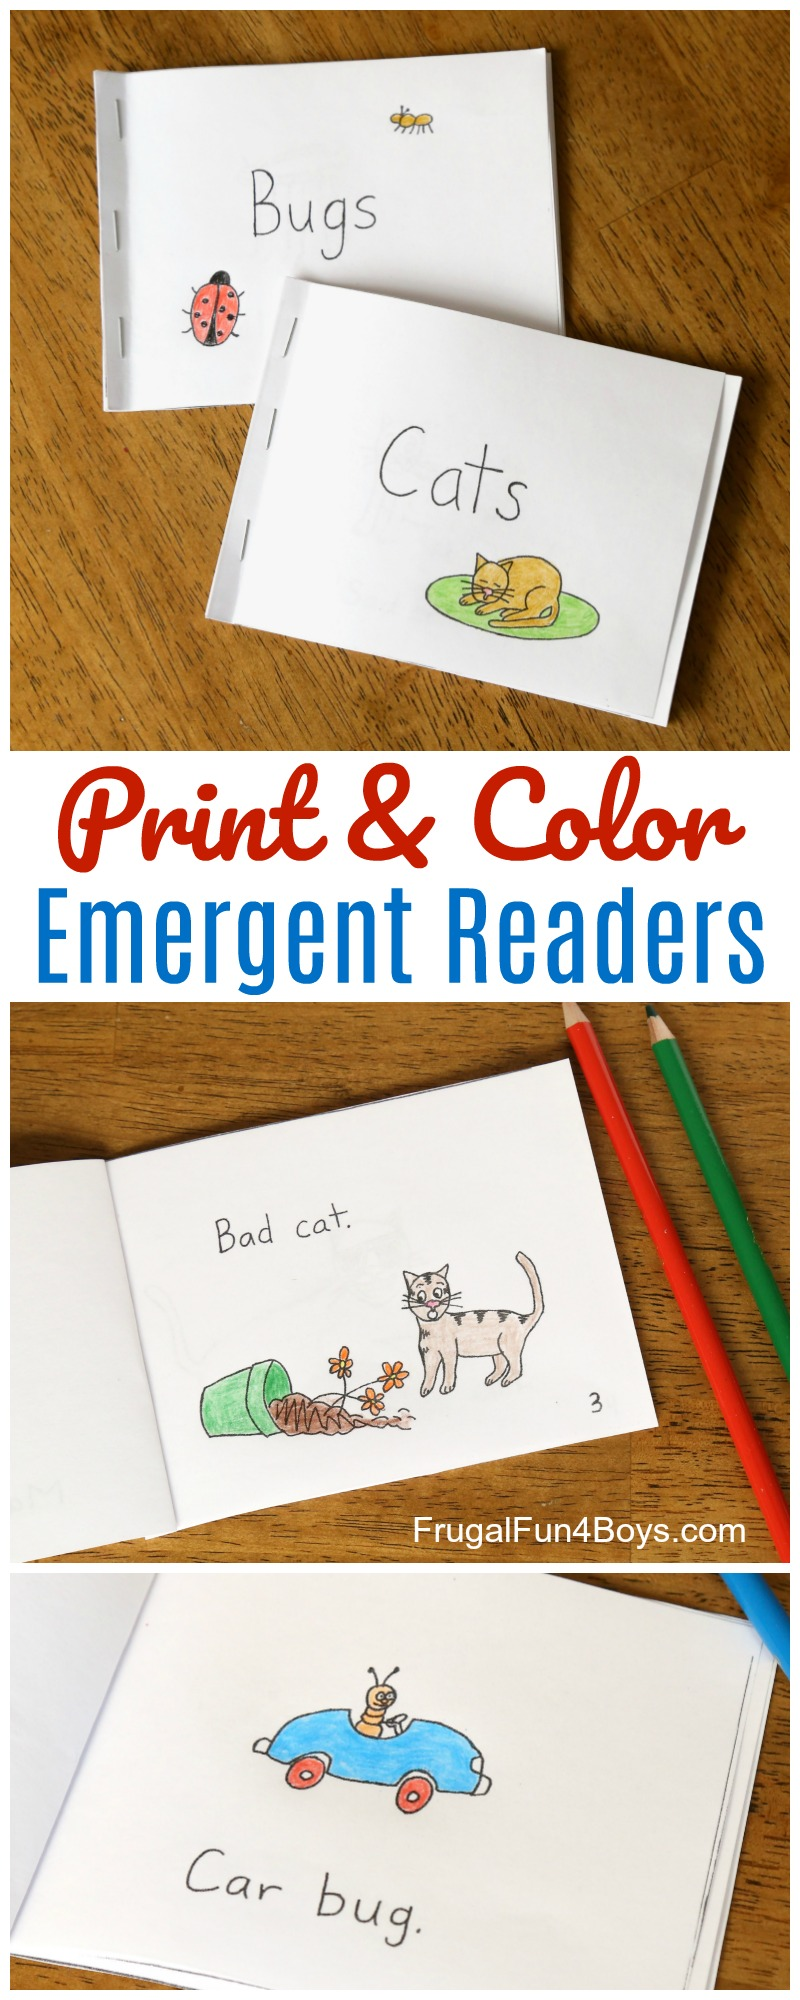 It is an image of Gargantuan Printable Emergent Reader Books